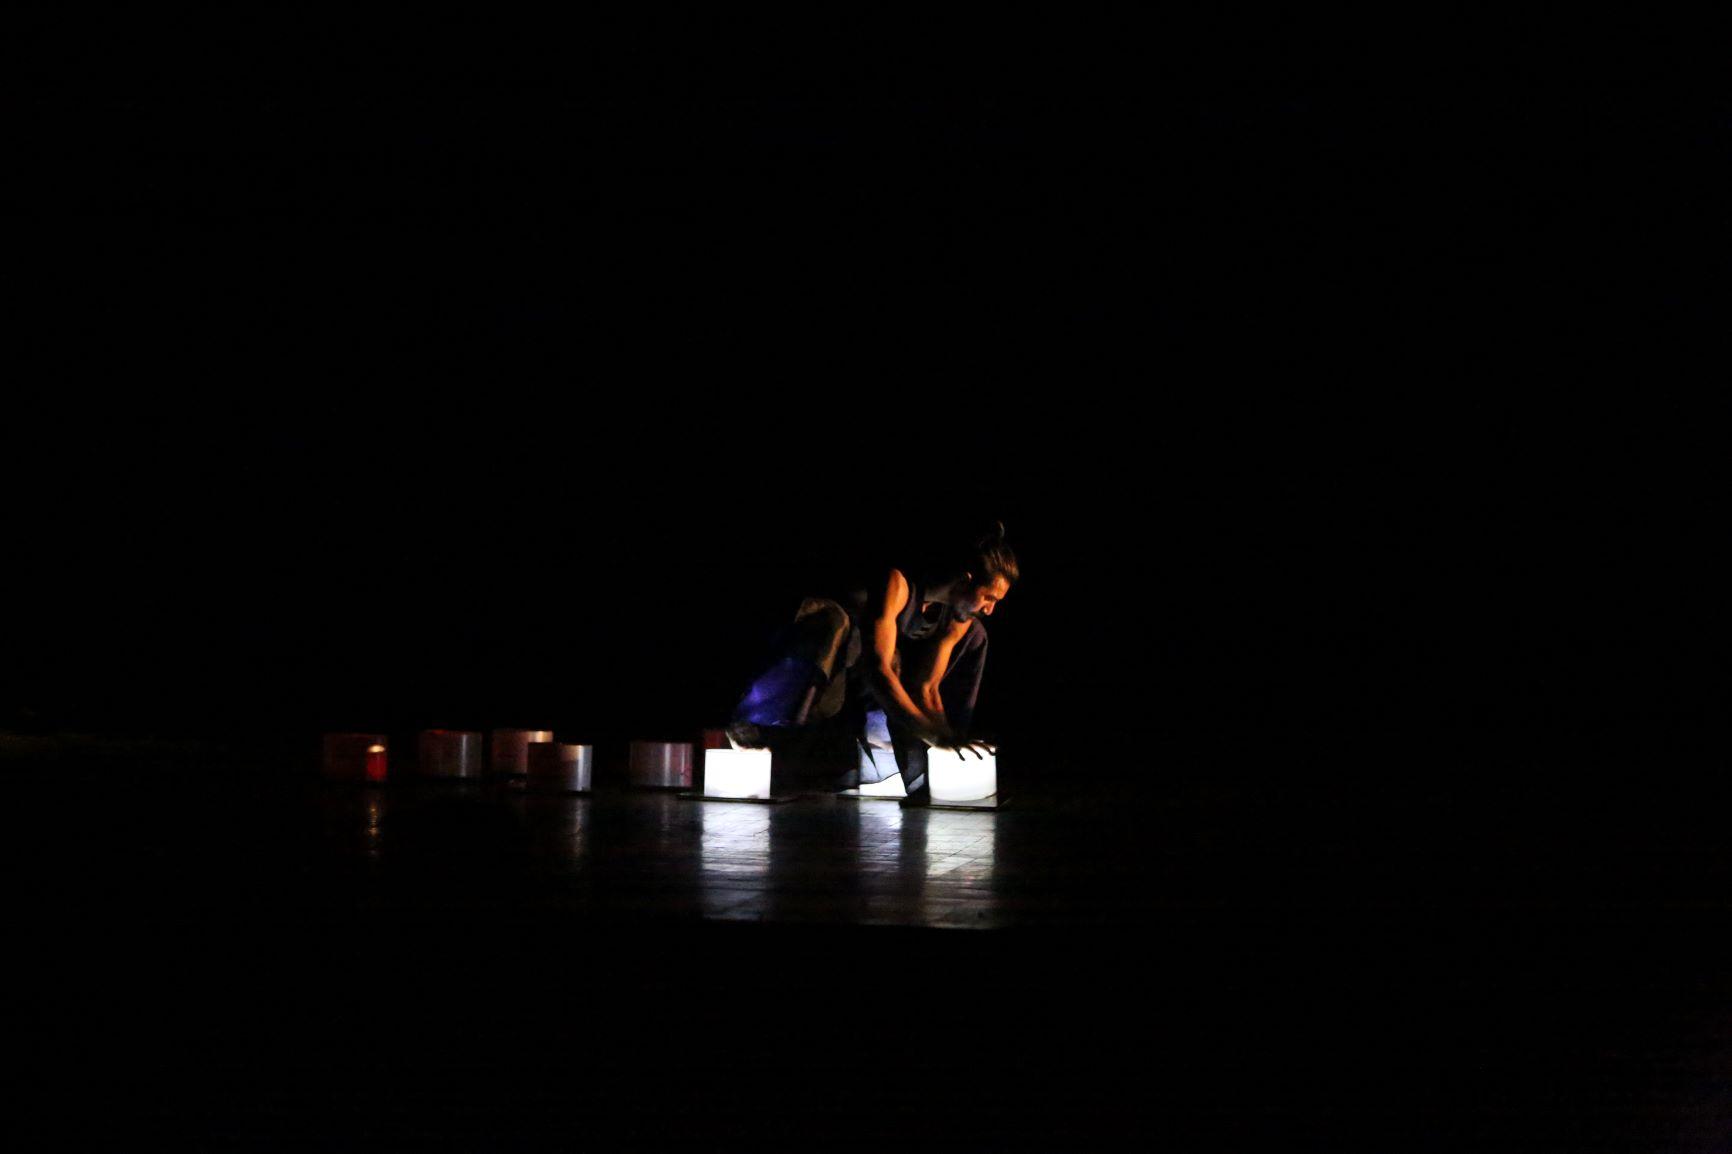 Vishwakiran Nambi, Adhyaya, LOKA studio for movement practices